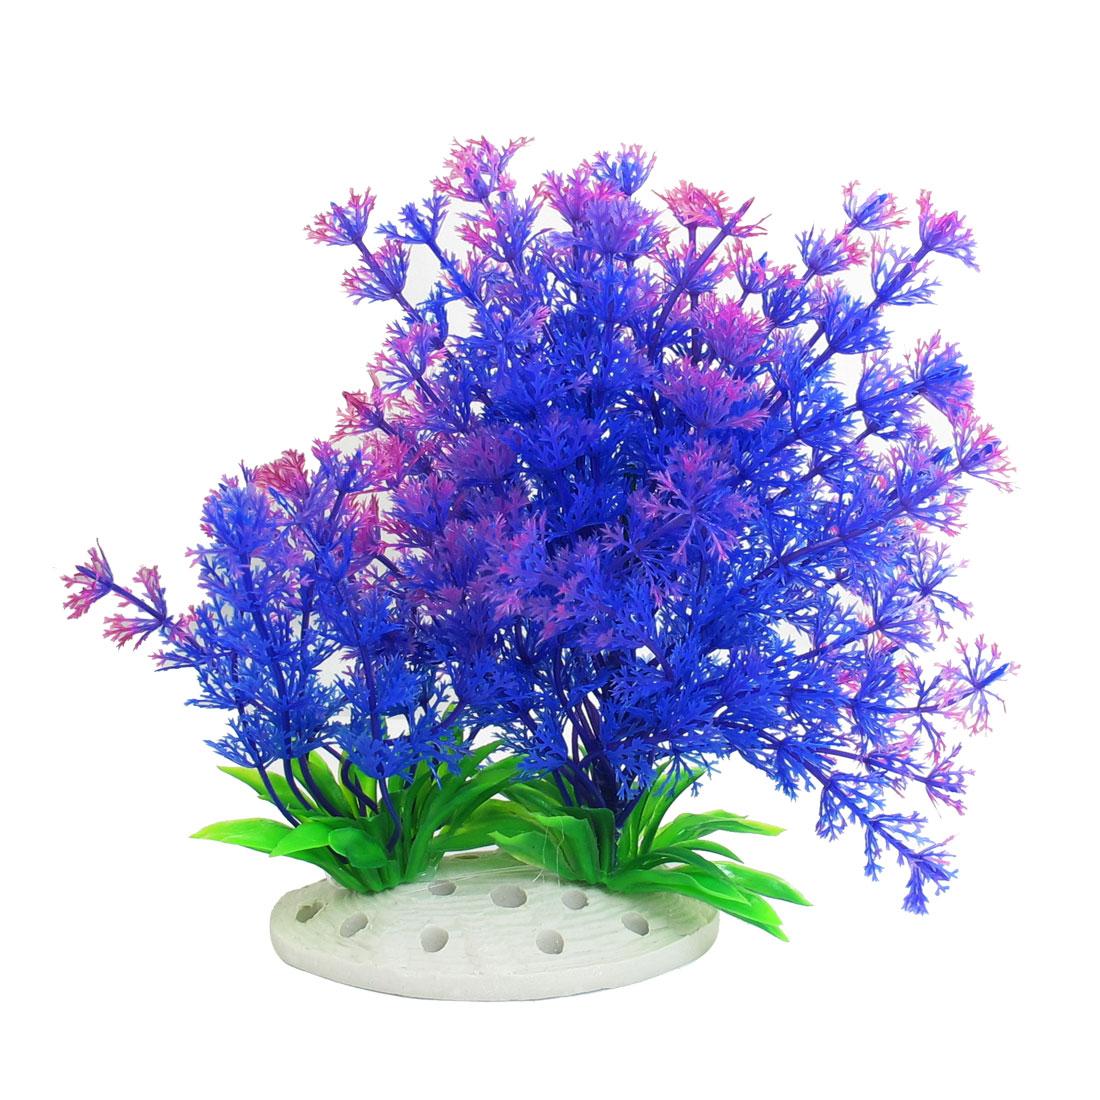 "6.7"" Height Purple Green Artificial Manmade Aquarium Decor Grass Plant"